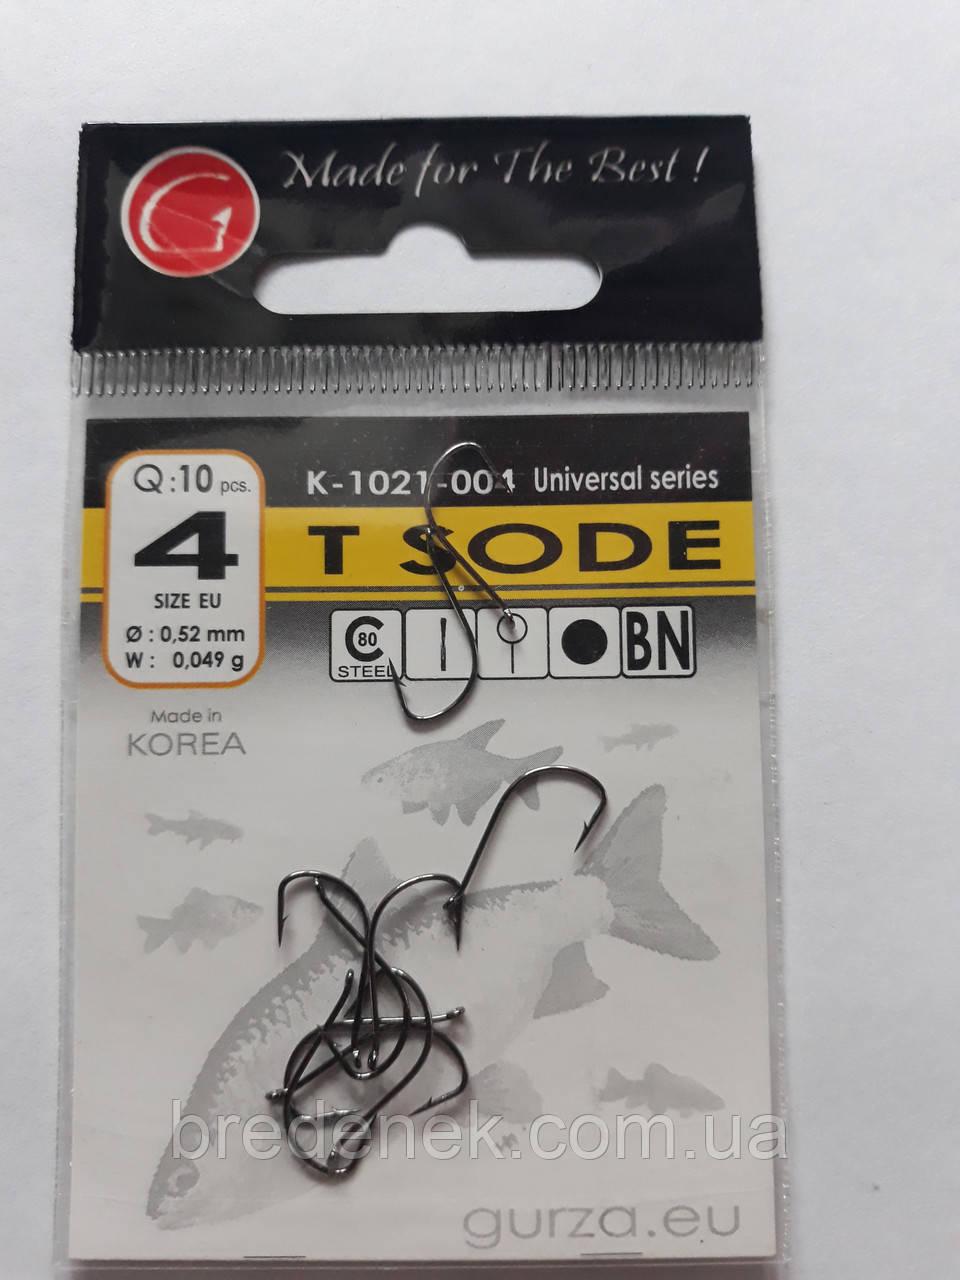 Крючки Gurza tokyo sode № 4